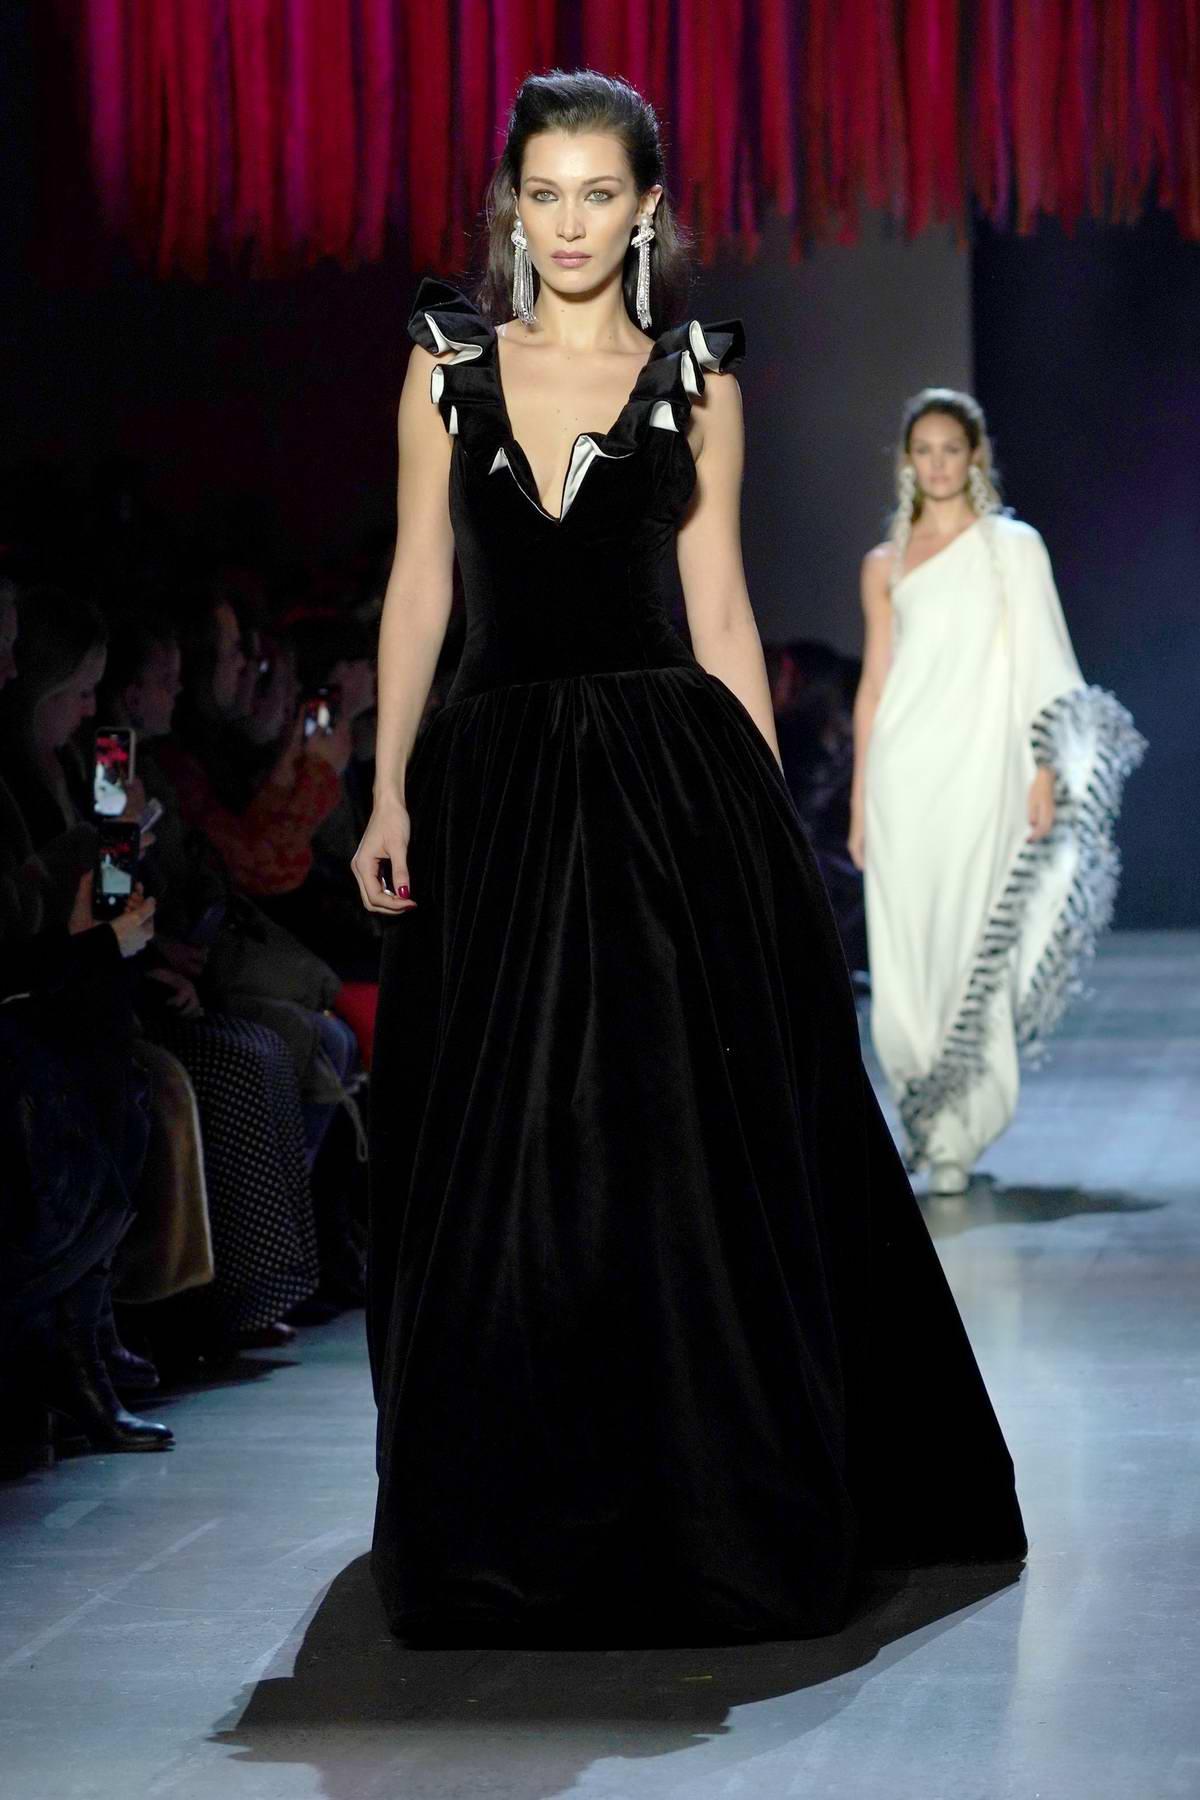 Bella Hadid walks the runway for the Prabal Gurung fashion show during New York Fashion Week in New York City